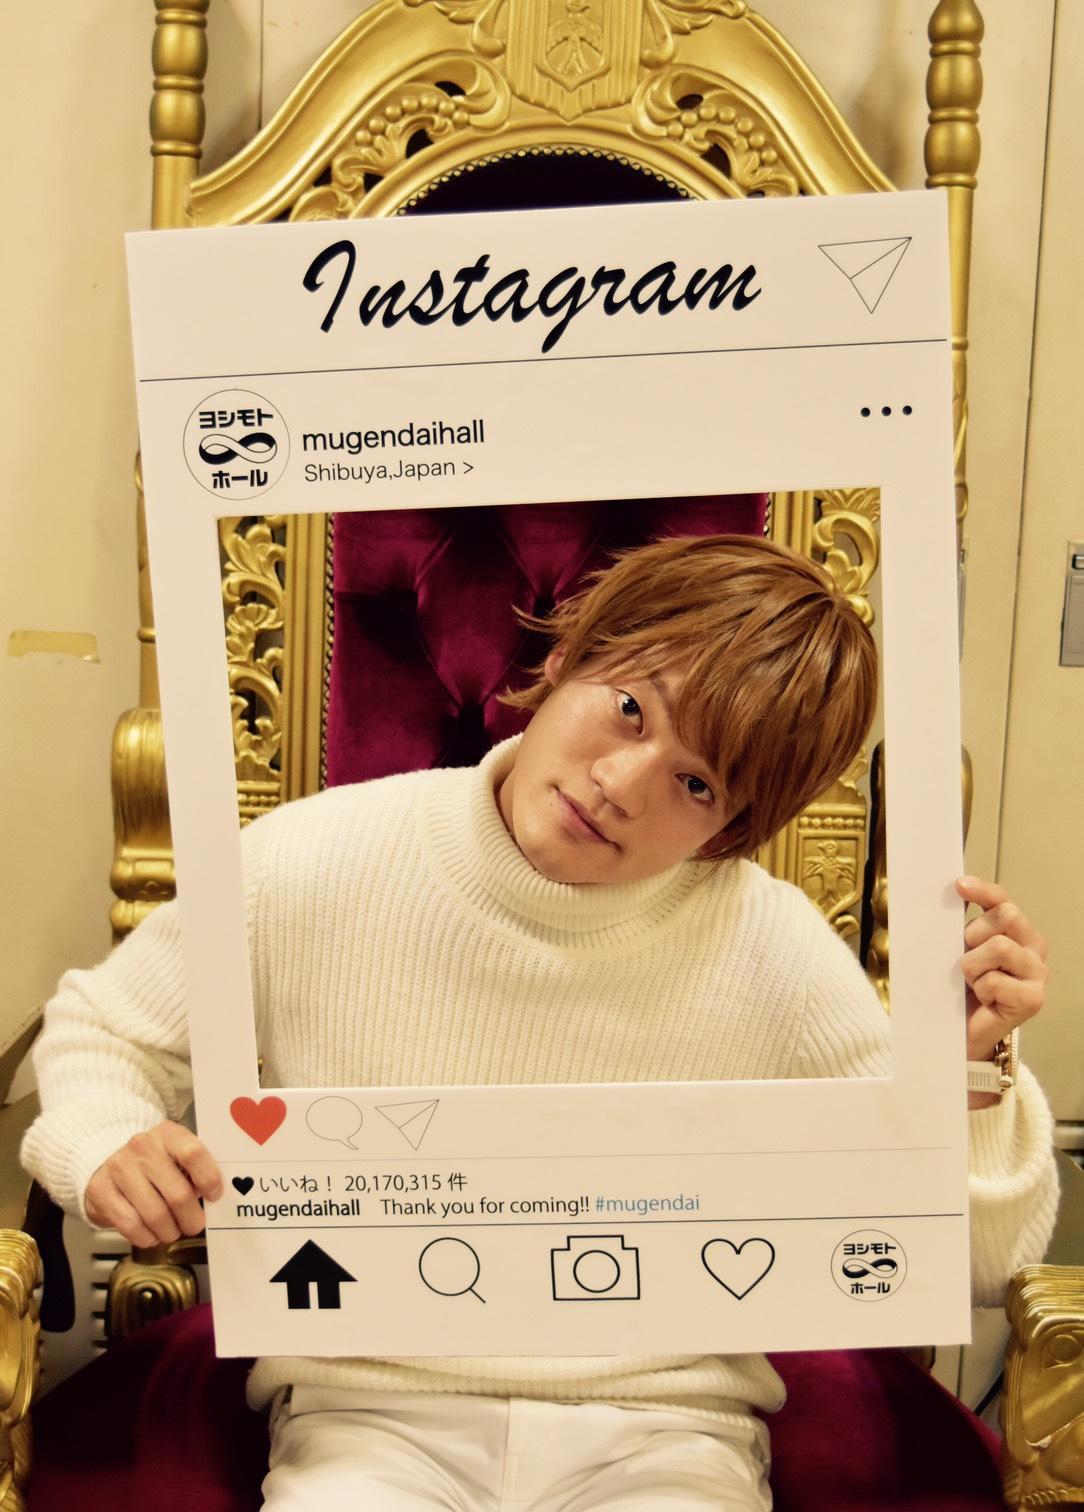 http://news.yoshimoto.co.jp/20170331102817-901416e4a644433731396a37097ba0f814aa4073.jpg